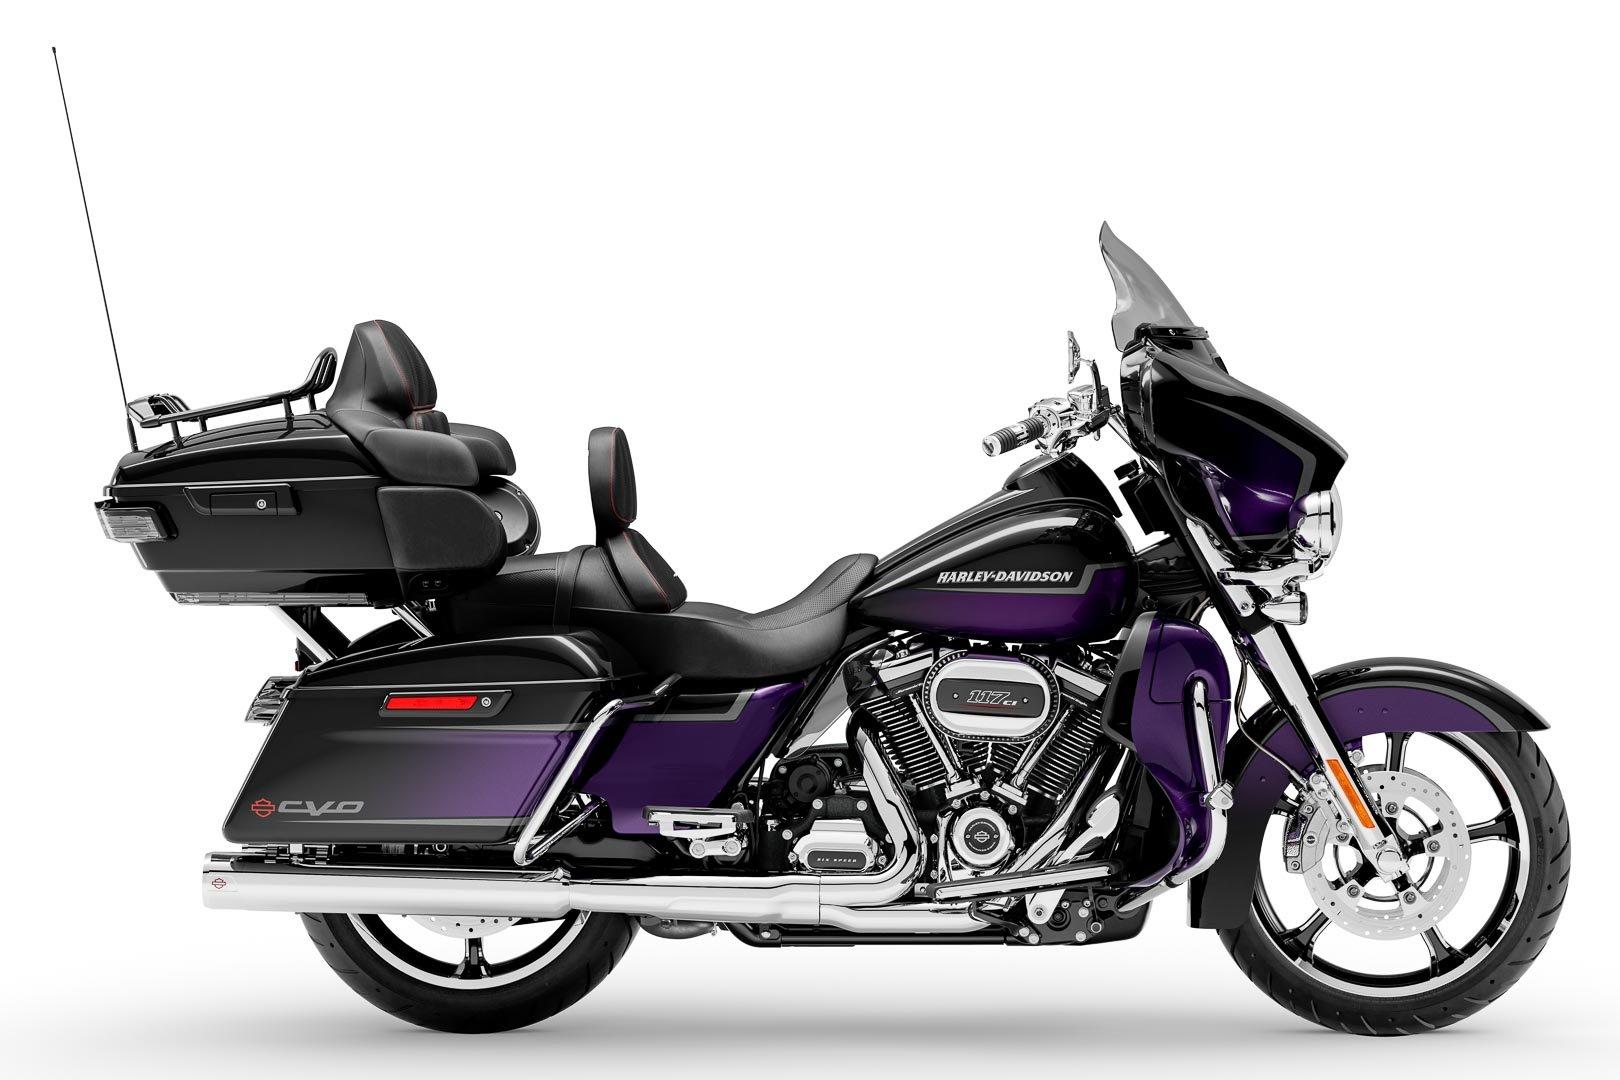 2021 Harley-Davidson CVO Limited First Look: Updates, Specs, Photos